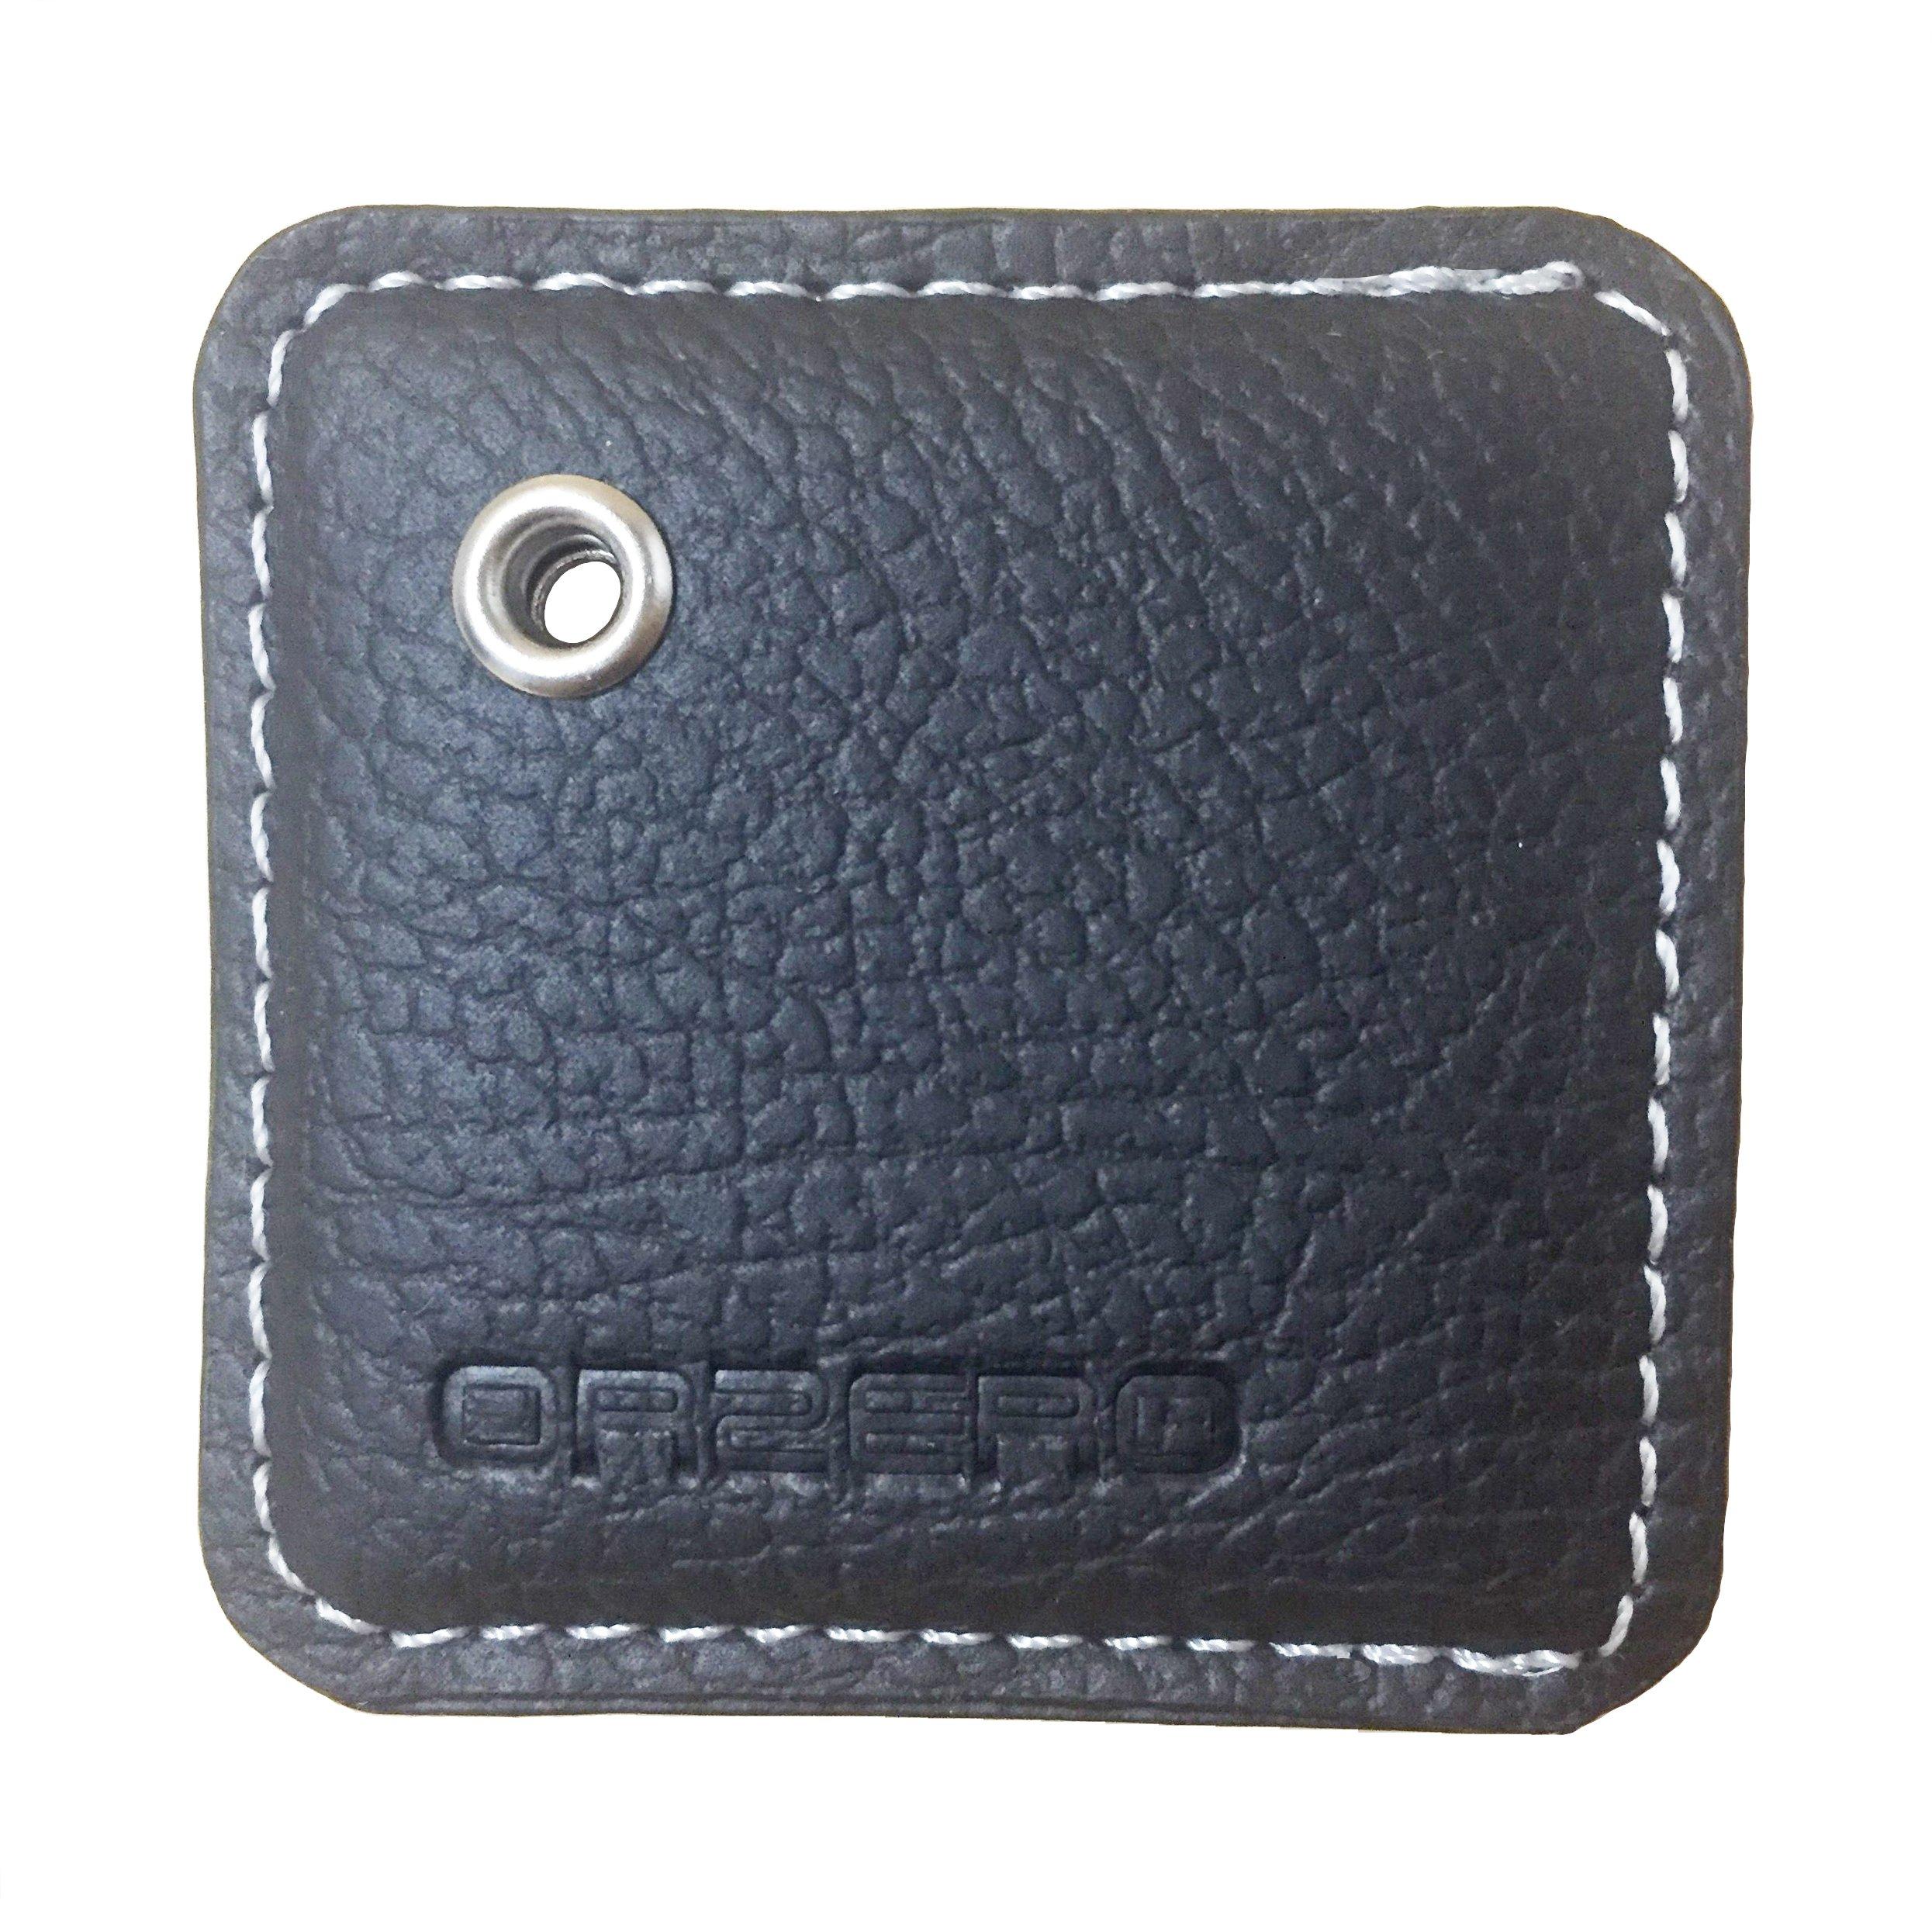 orzero case compatiable for new tile